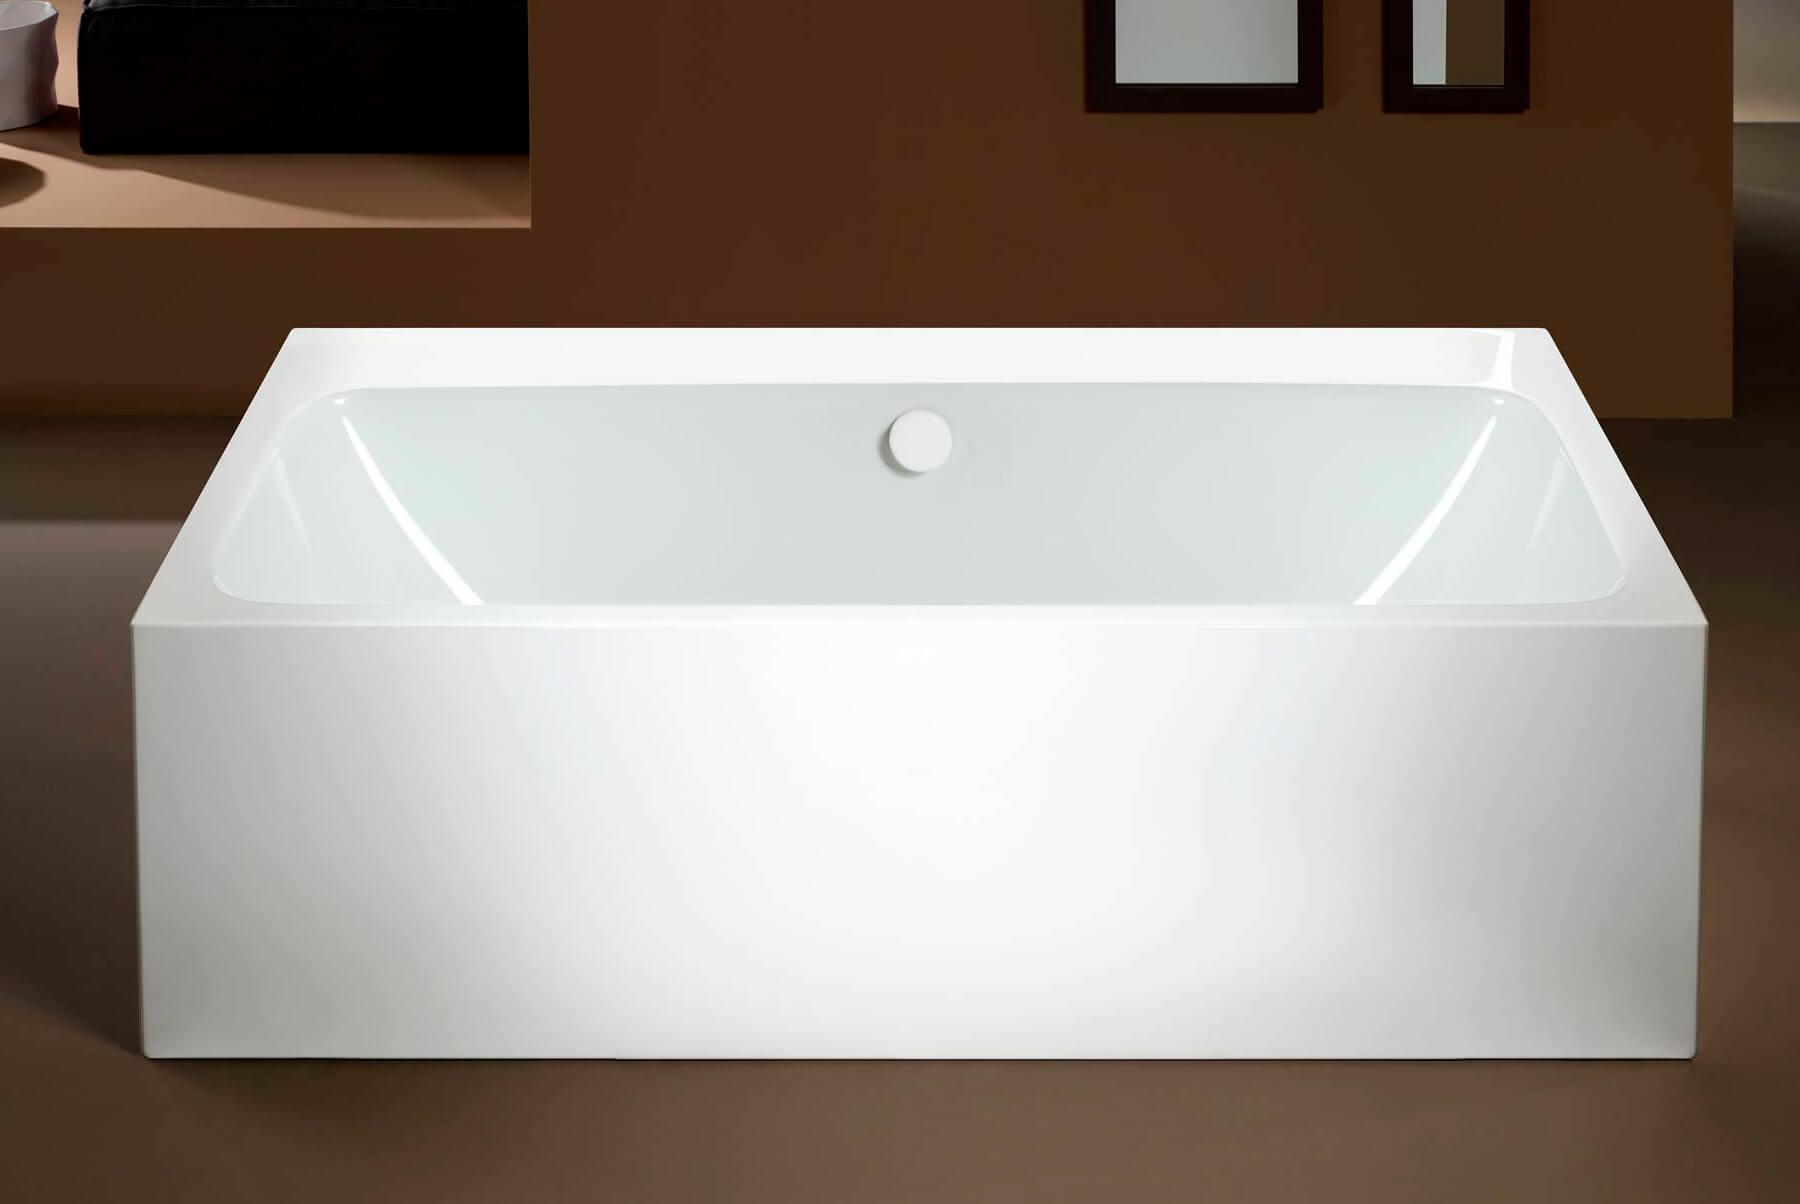 Bath-Tubs-Kaldewei-asymmetric-3-1800x1204